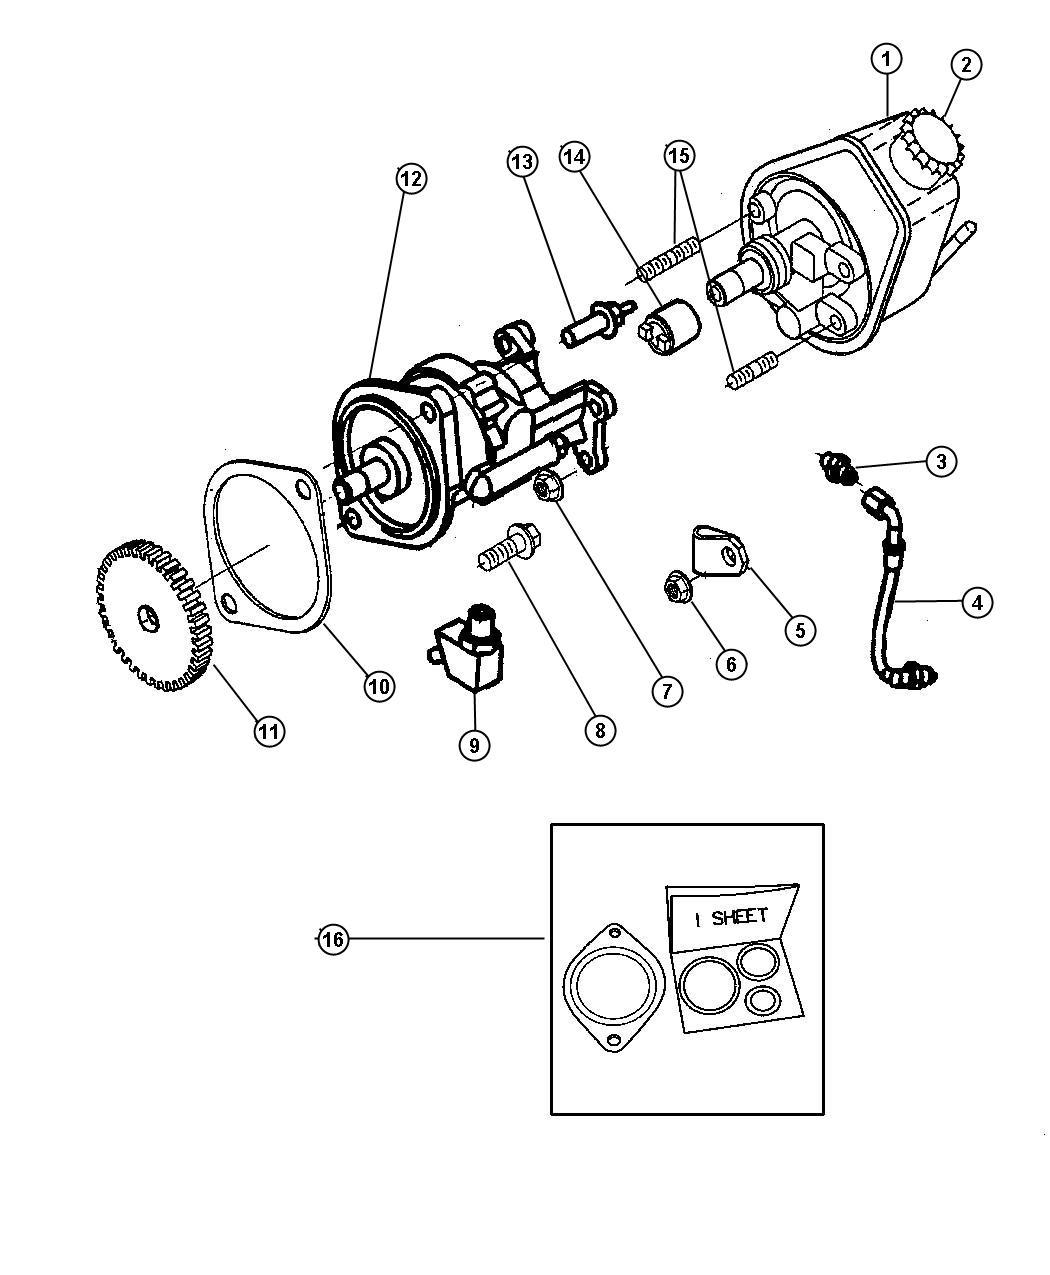 Dodge Ram Quad Cab 5 9l V8 Mpi 5 Speed Manual